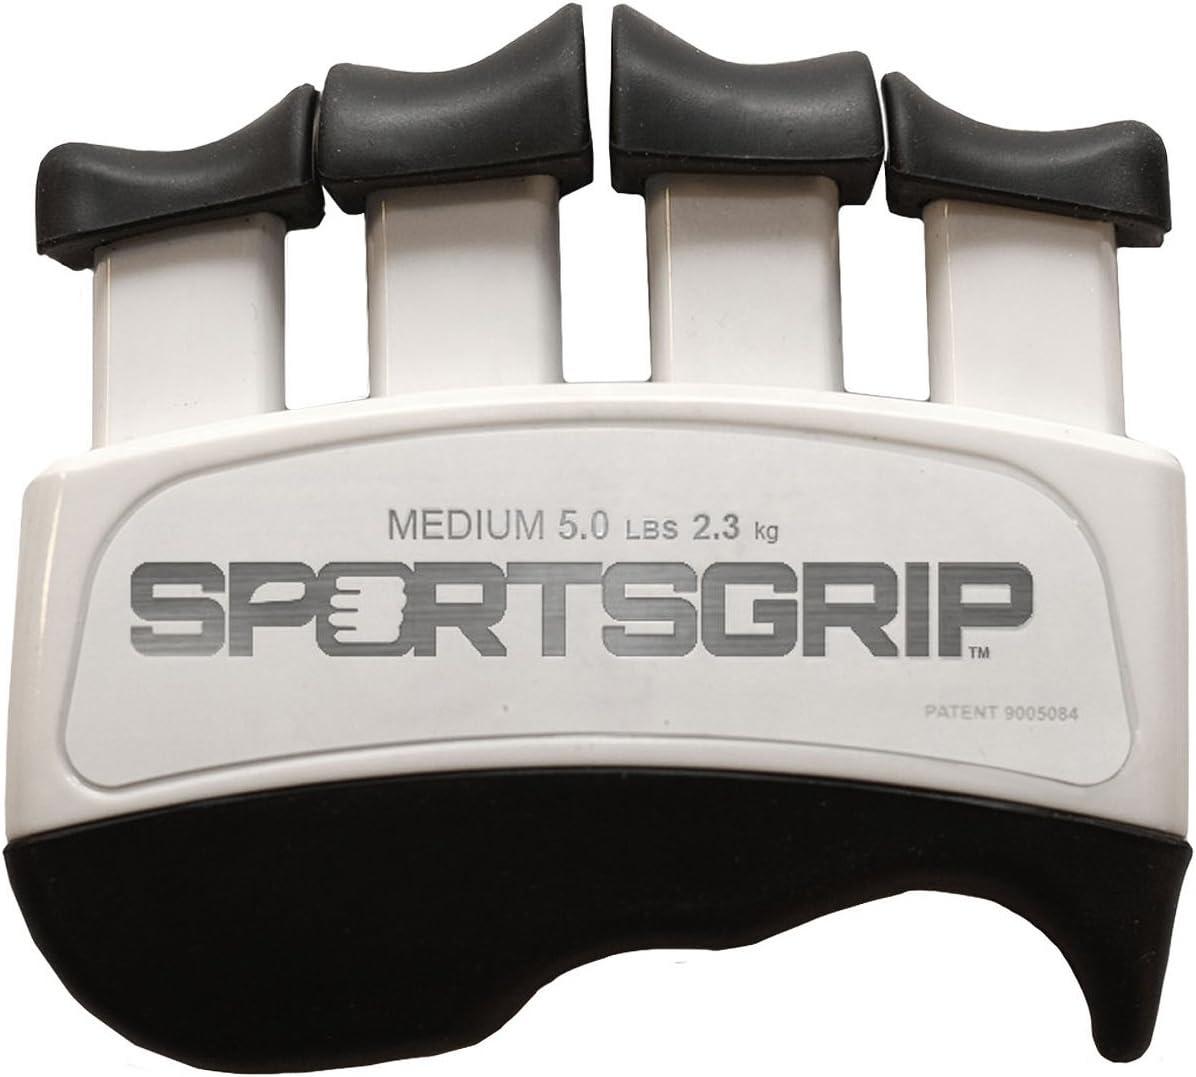 Max 85% OFF SPORTSGRIP Hand Cheap SALE Start and Finger Exerciser 2.3kg 5 Medium lb